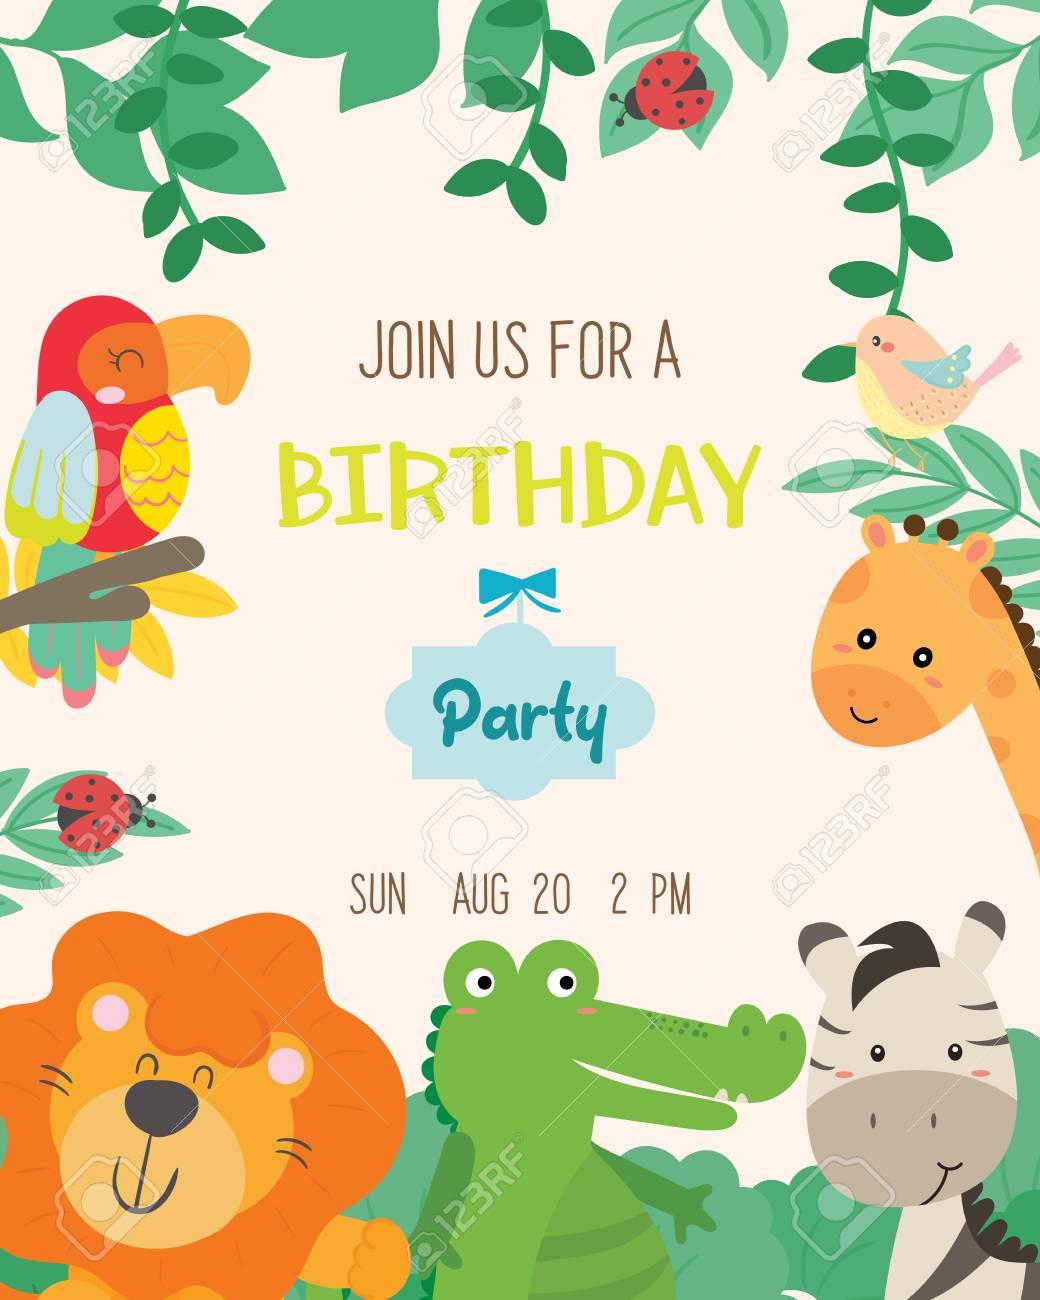 Cute Animal Theme Birthday Party Invitation Card Vector Illustration Stock